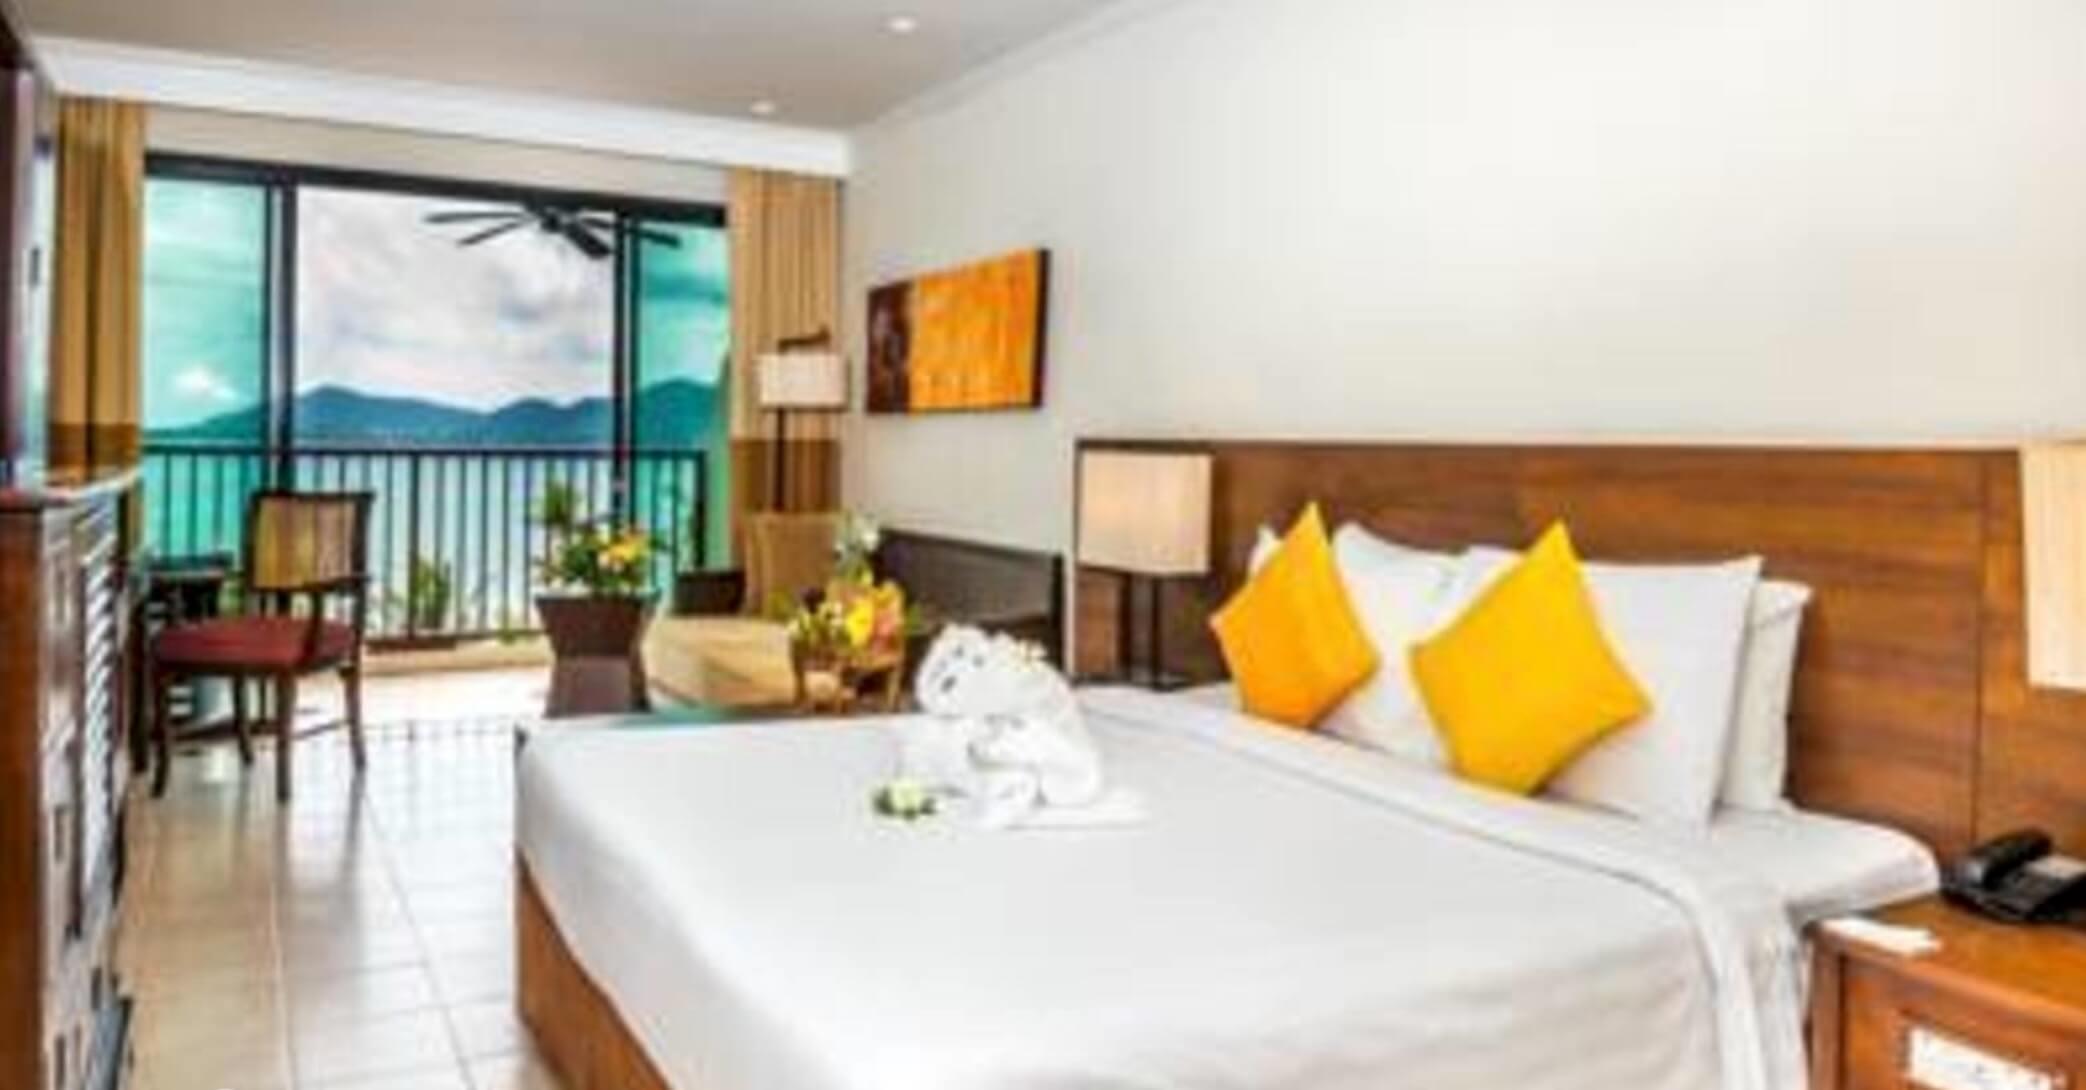 Тур на Пхукет в отель Panwa Boutique Beach Resort 4* (Таиланд) на 7 ночей с 25.01.19 от 88 180 рублей (BB) на двоих